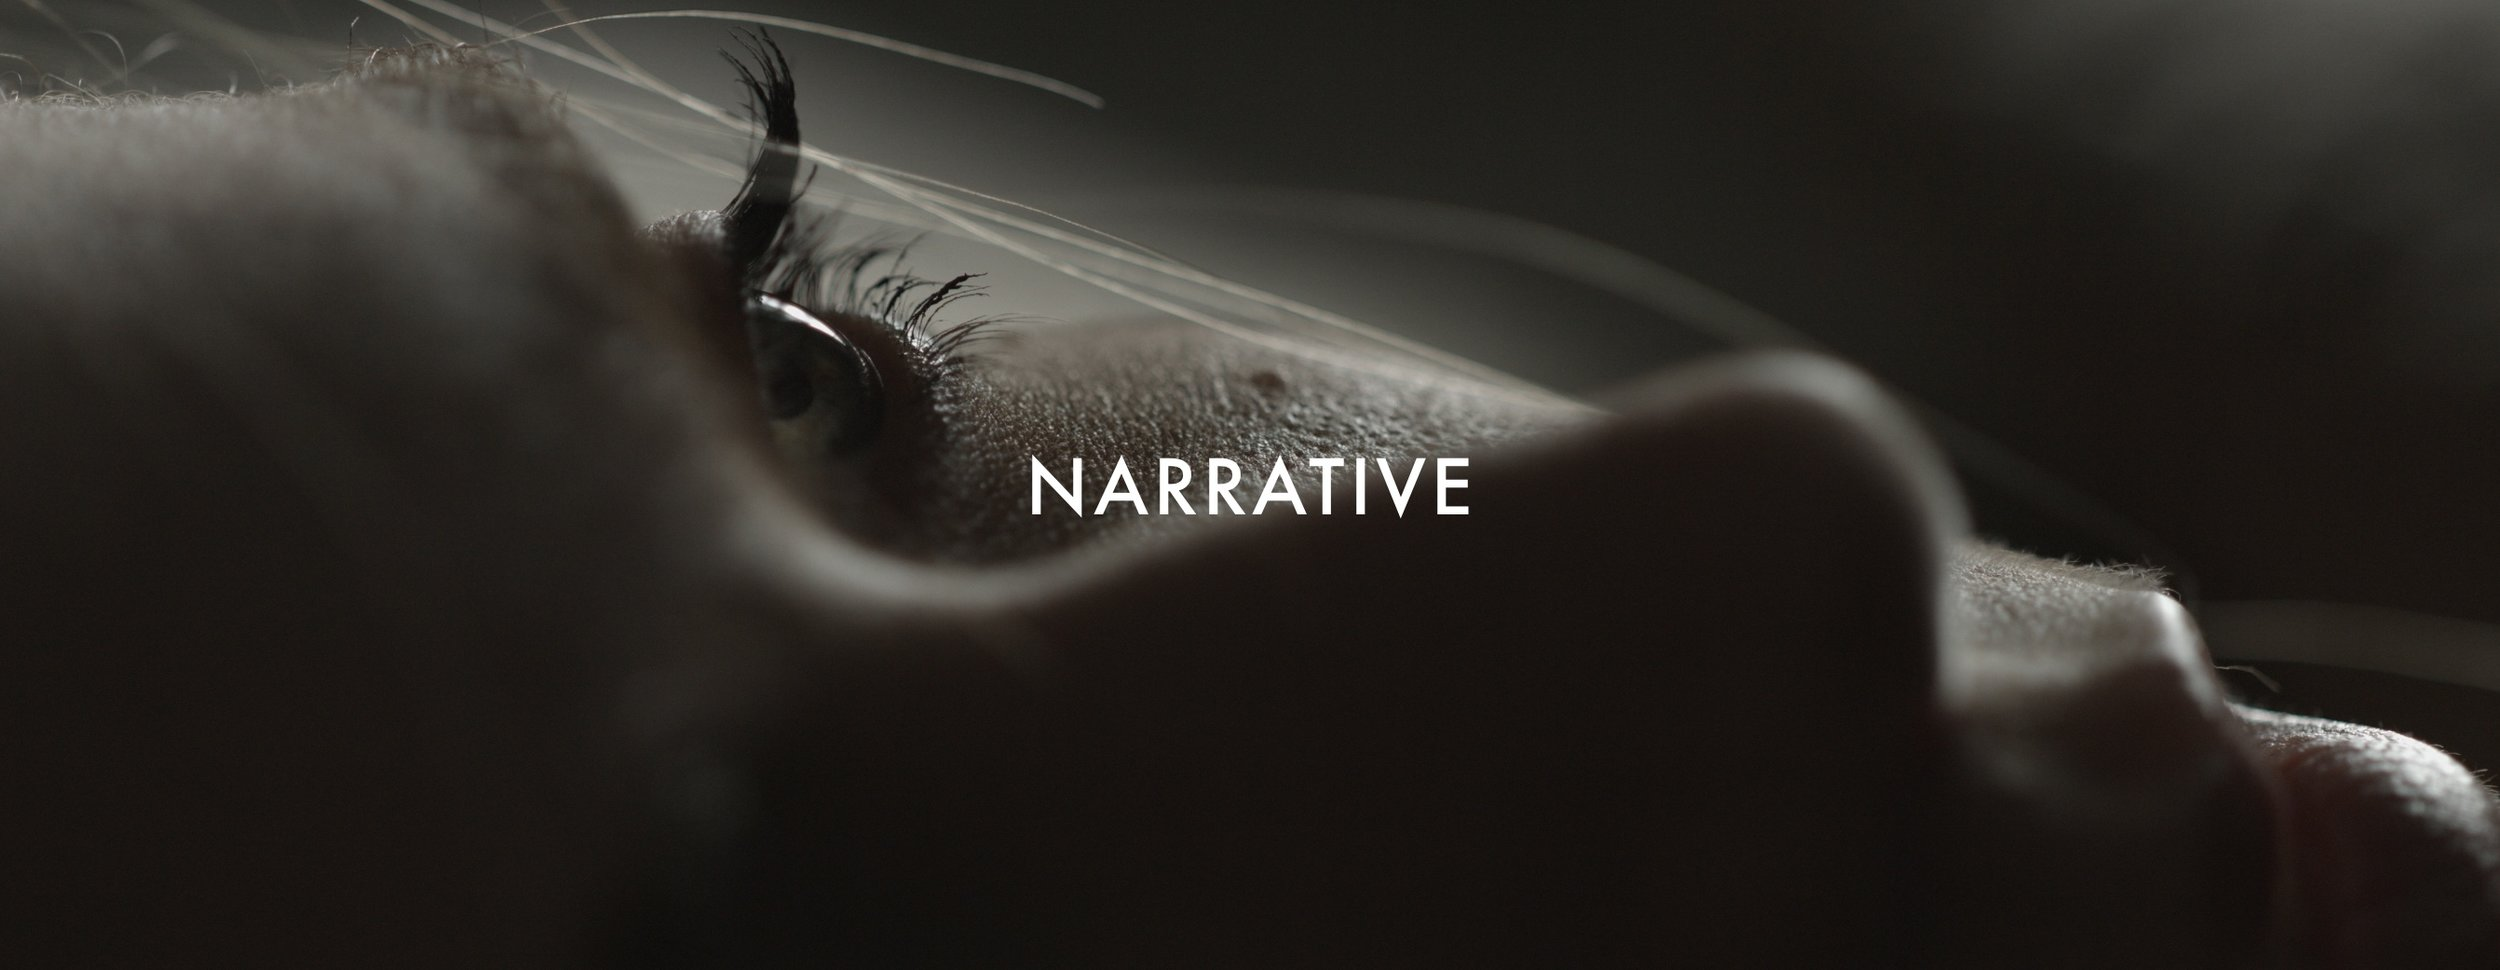 narrative_landing.jpg